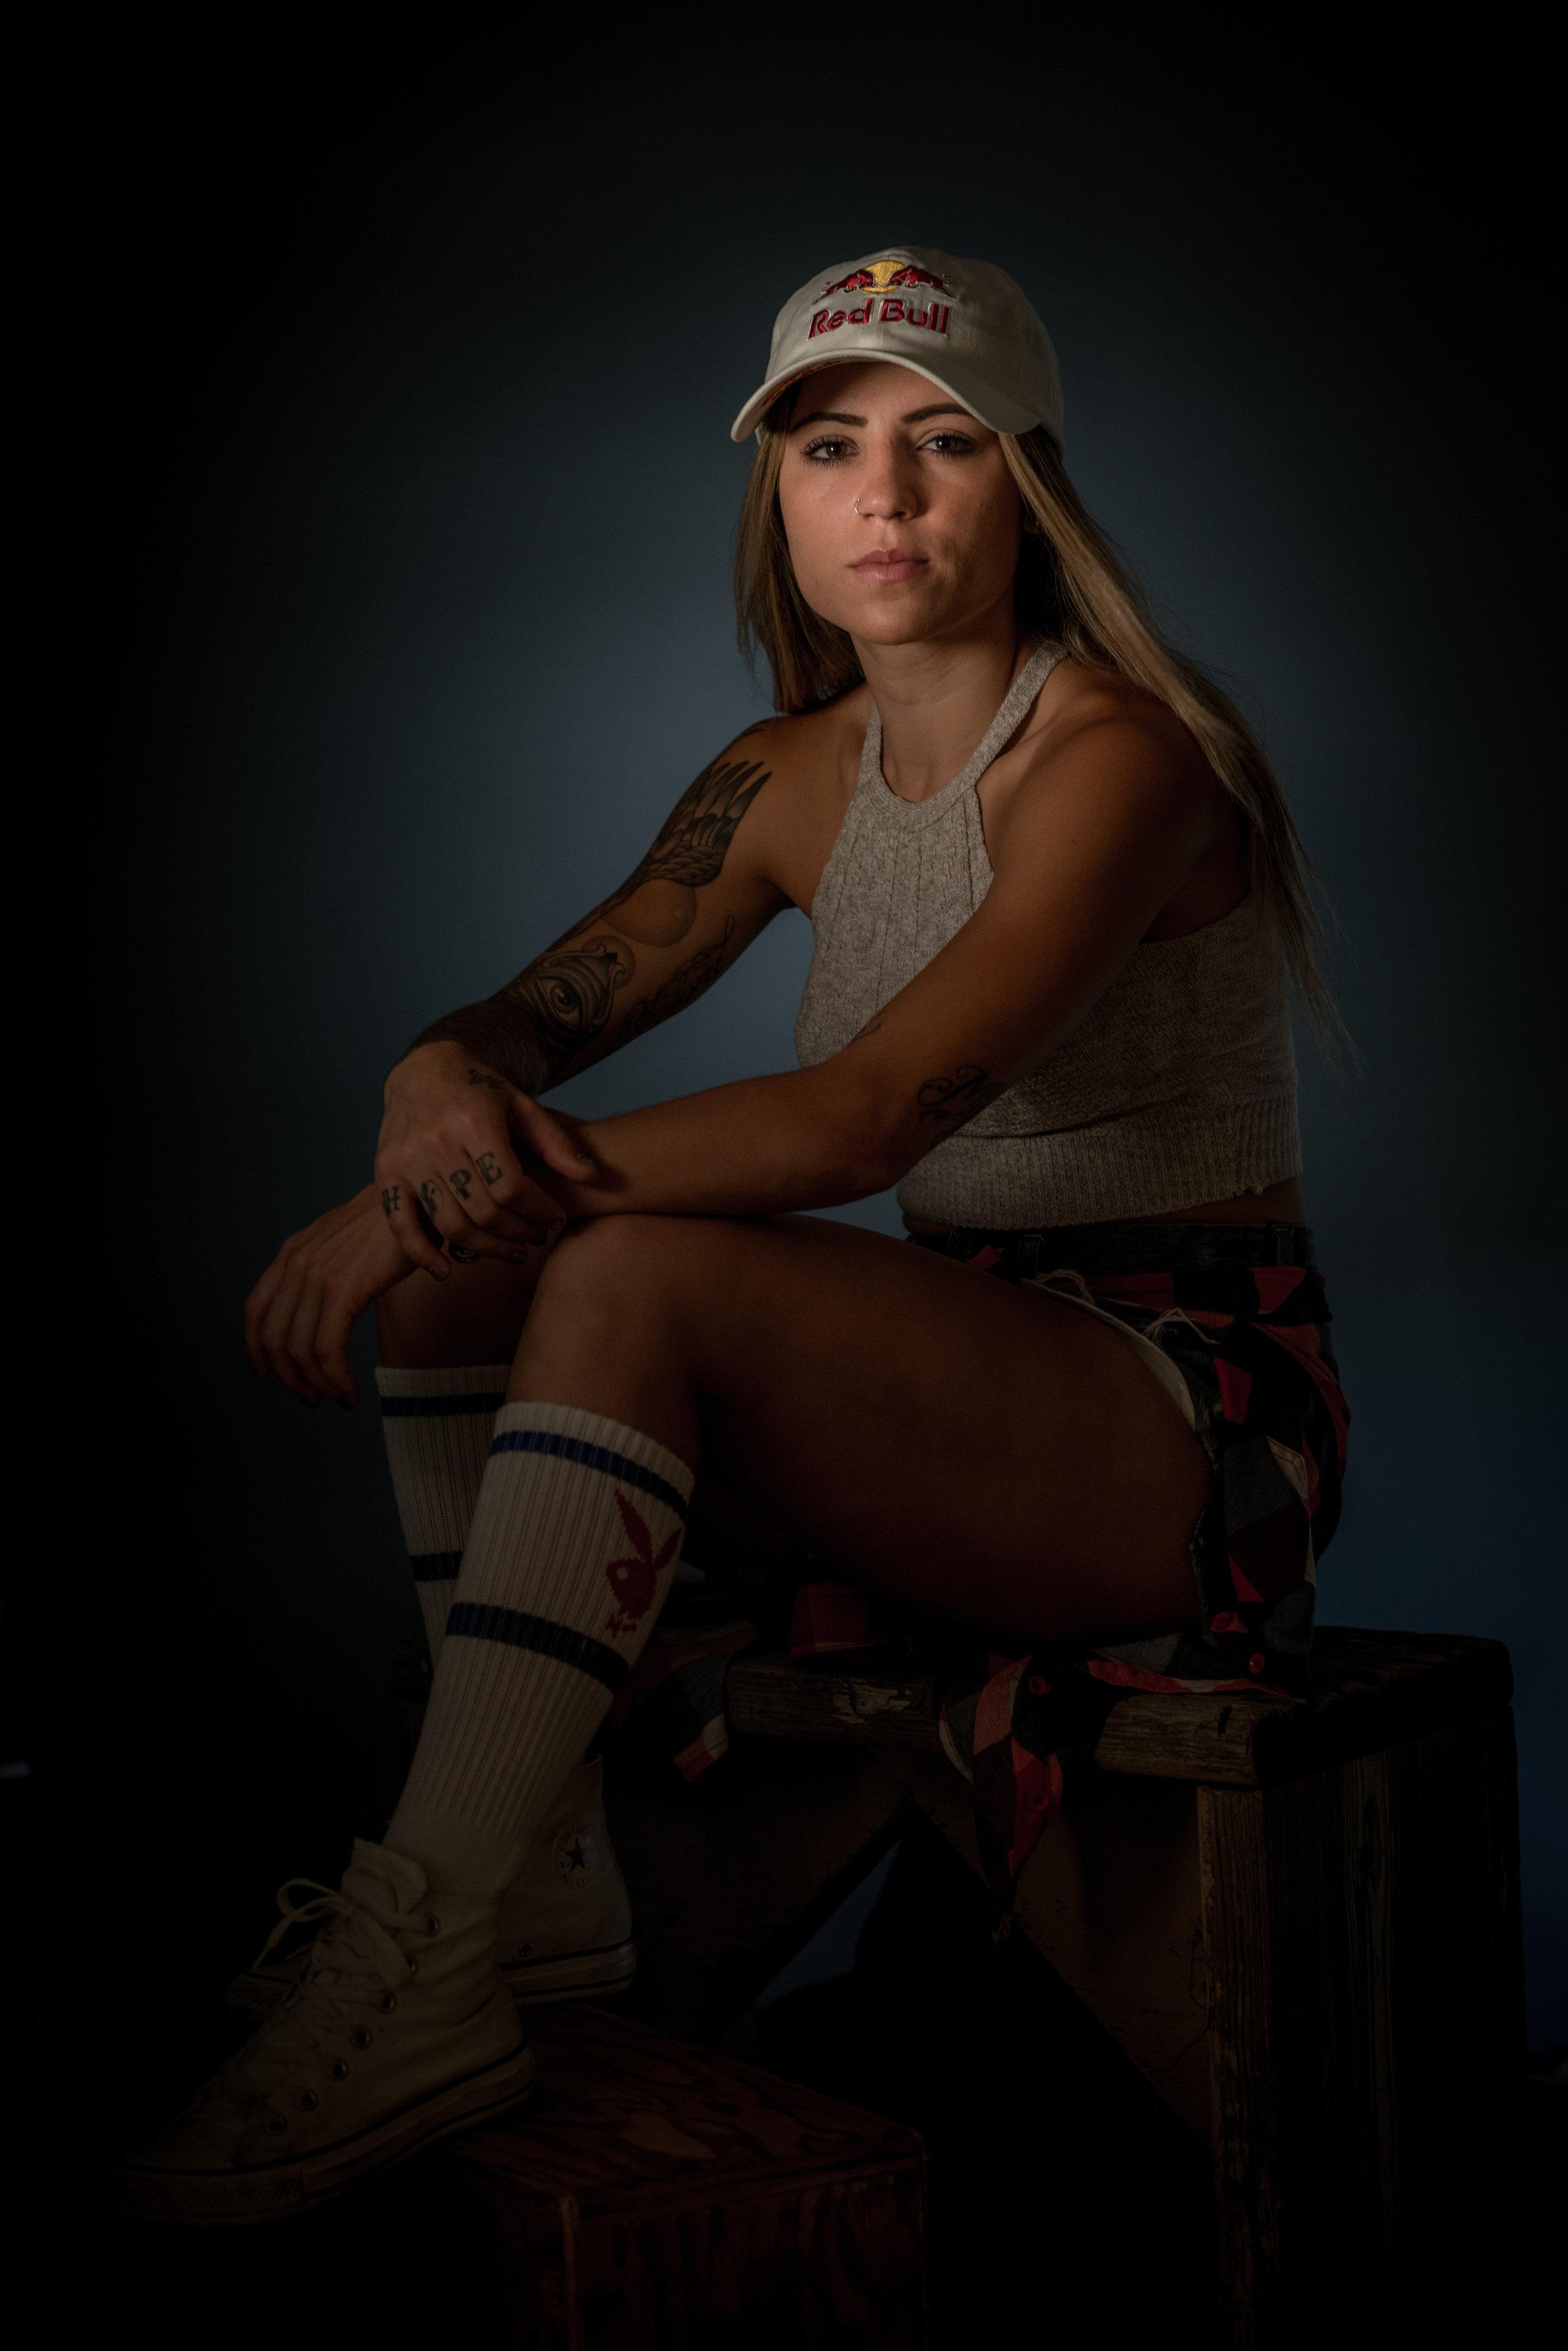 Leticia Bufonis, Spicewood, Texas. Sony A7rii, Leica M 75mm Summilux